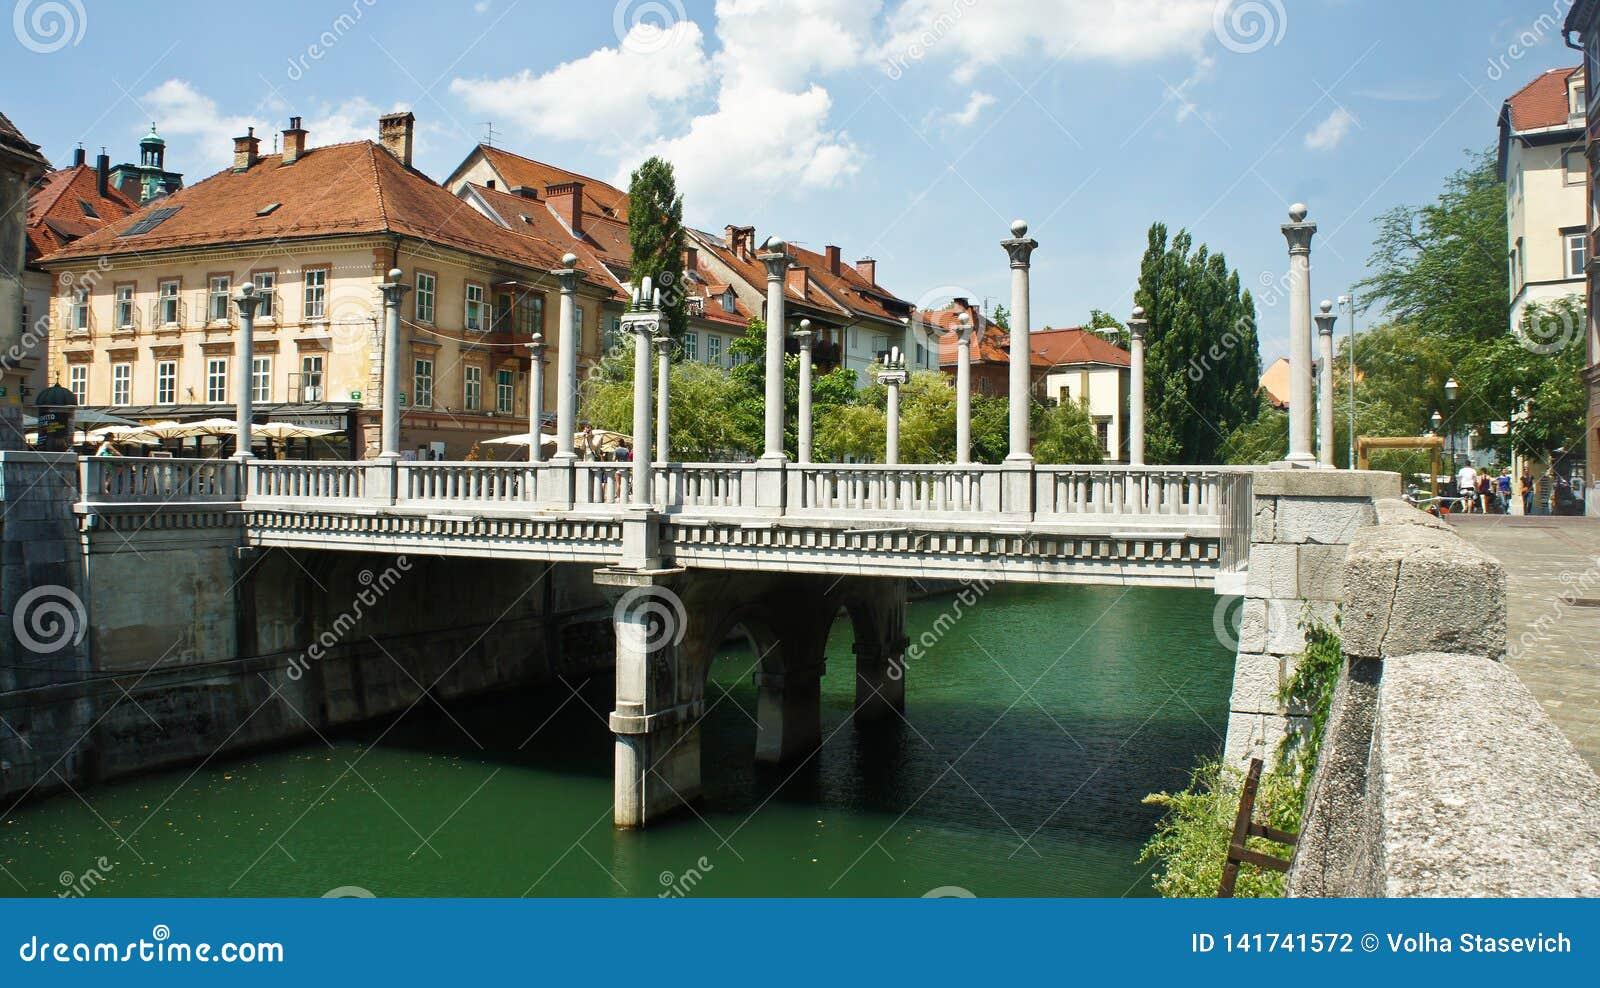 Ljubljana, Slovenia - 07/19/2015 - The Cobbler`s Bridge with Corinthian and Ionic pillars as lamp-bearers, sunny day